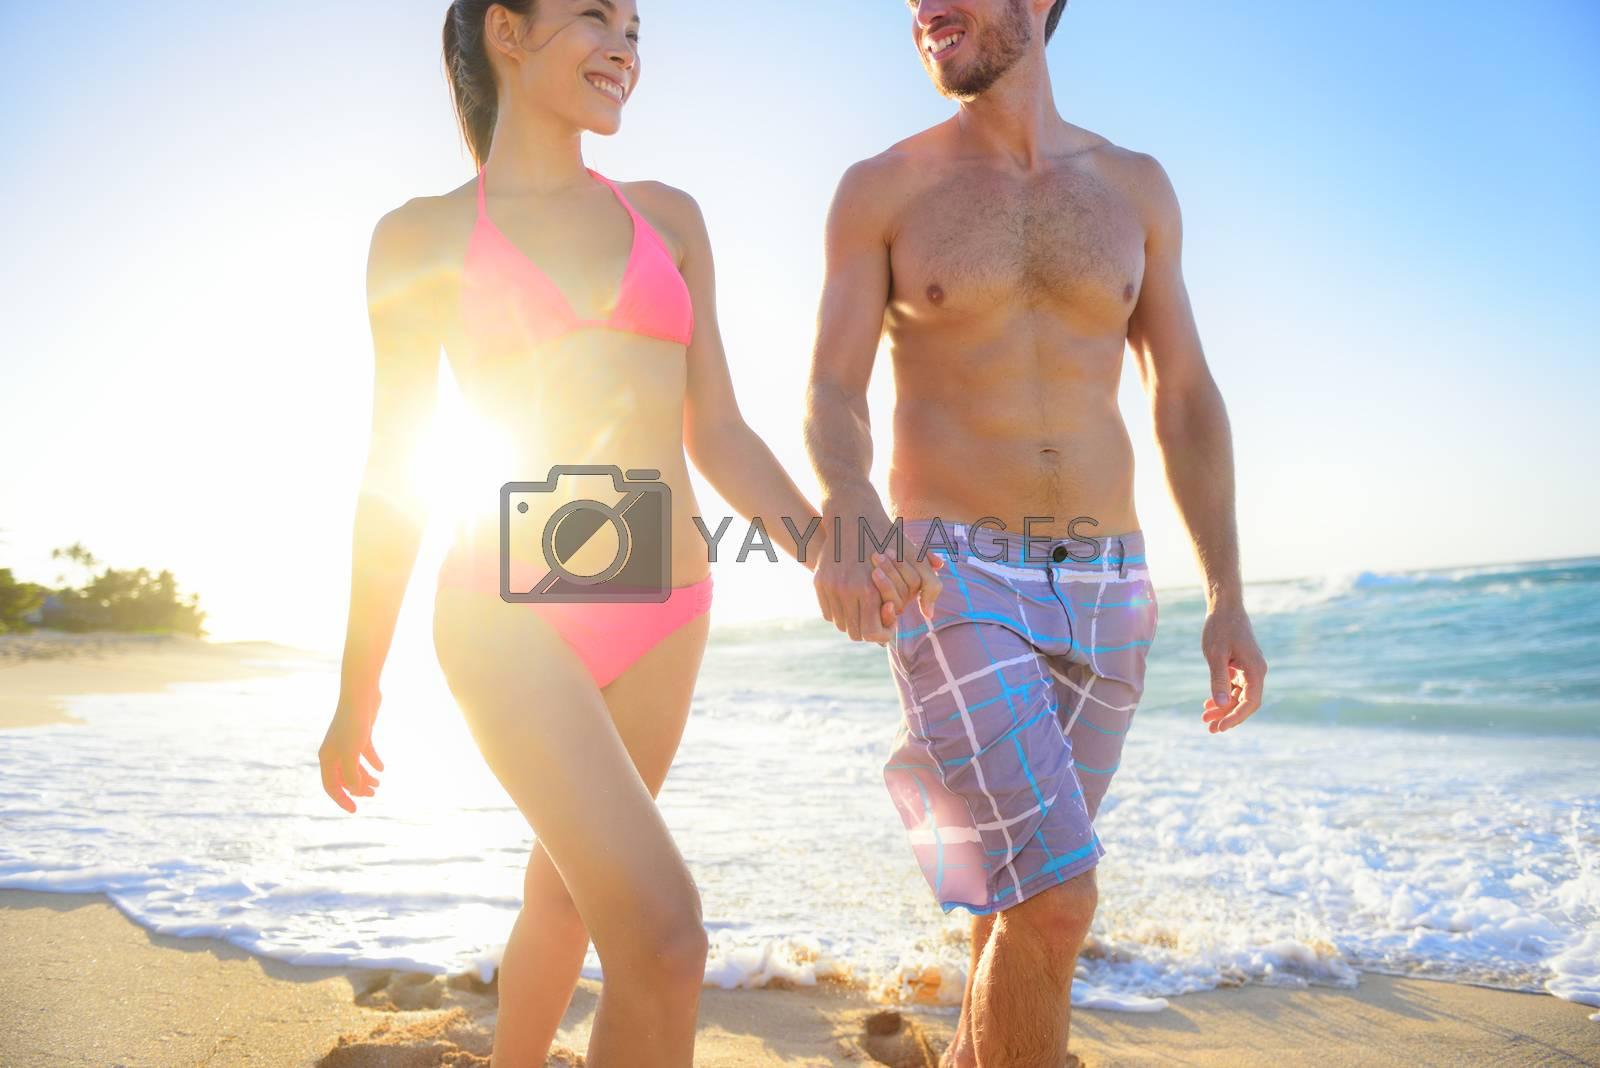 Mixed race couple walking holding hands happily smiling at beach sunset waterfront, enjoying summer honeymoon travel vacation. Hawaii